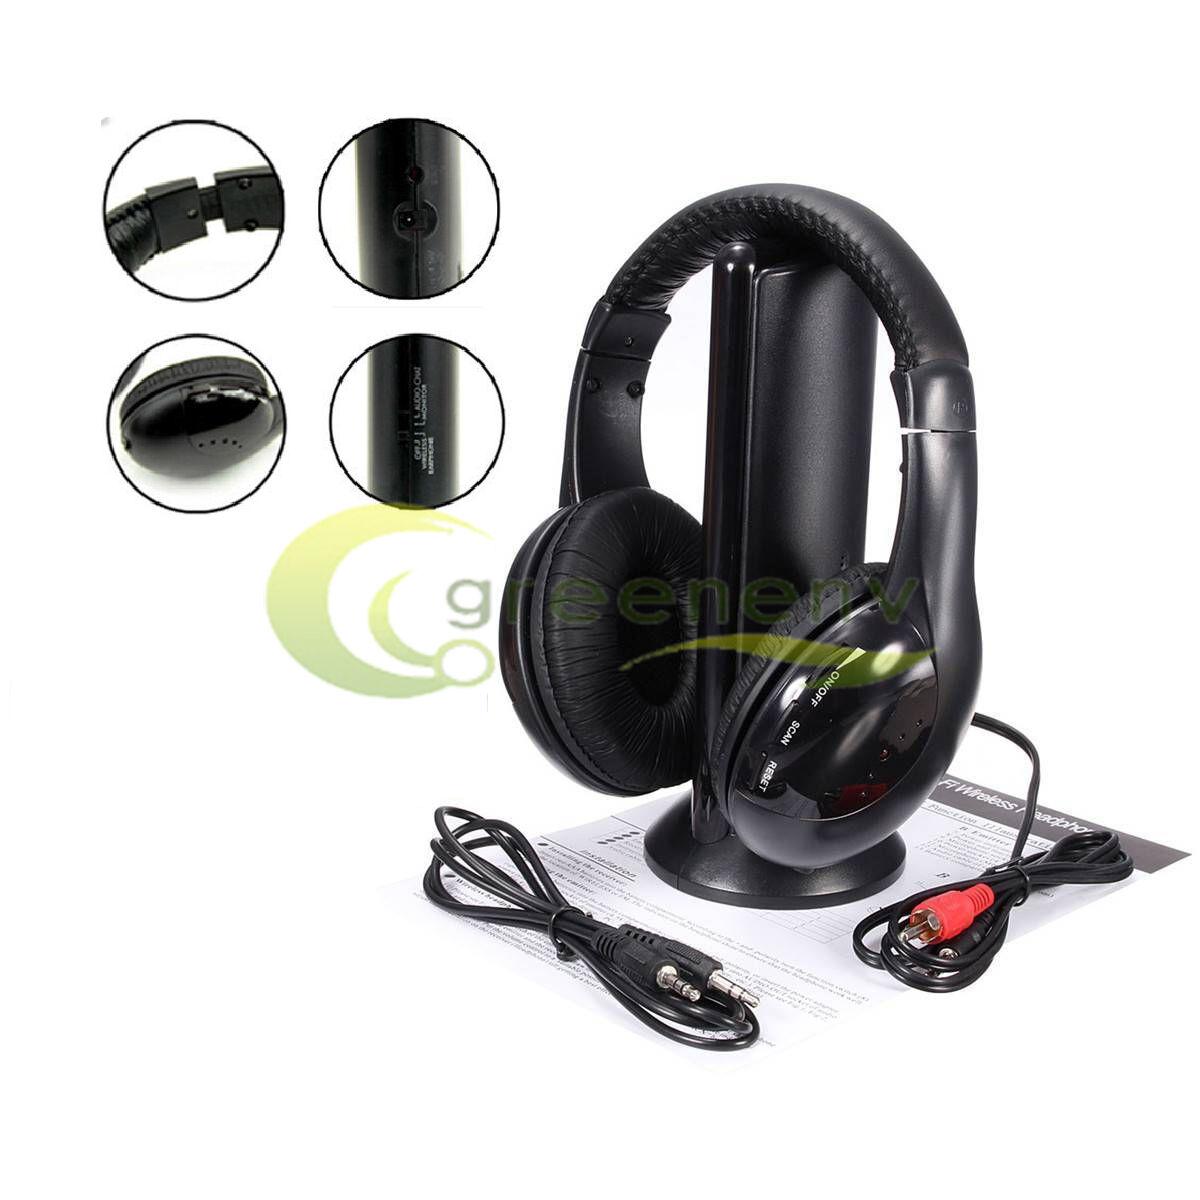 Hot 5 in 1 Hi-Fi Wireless Headset Headphone Earphone for TV